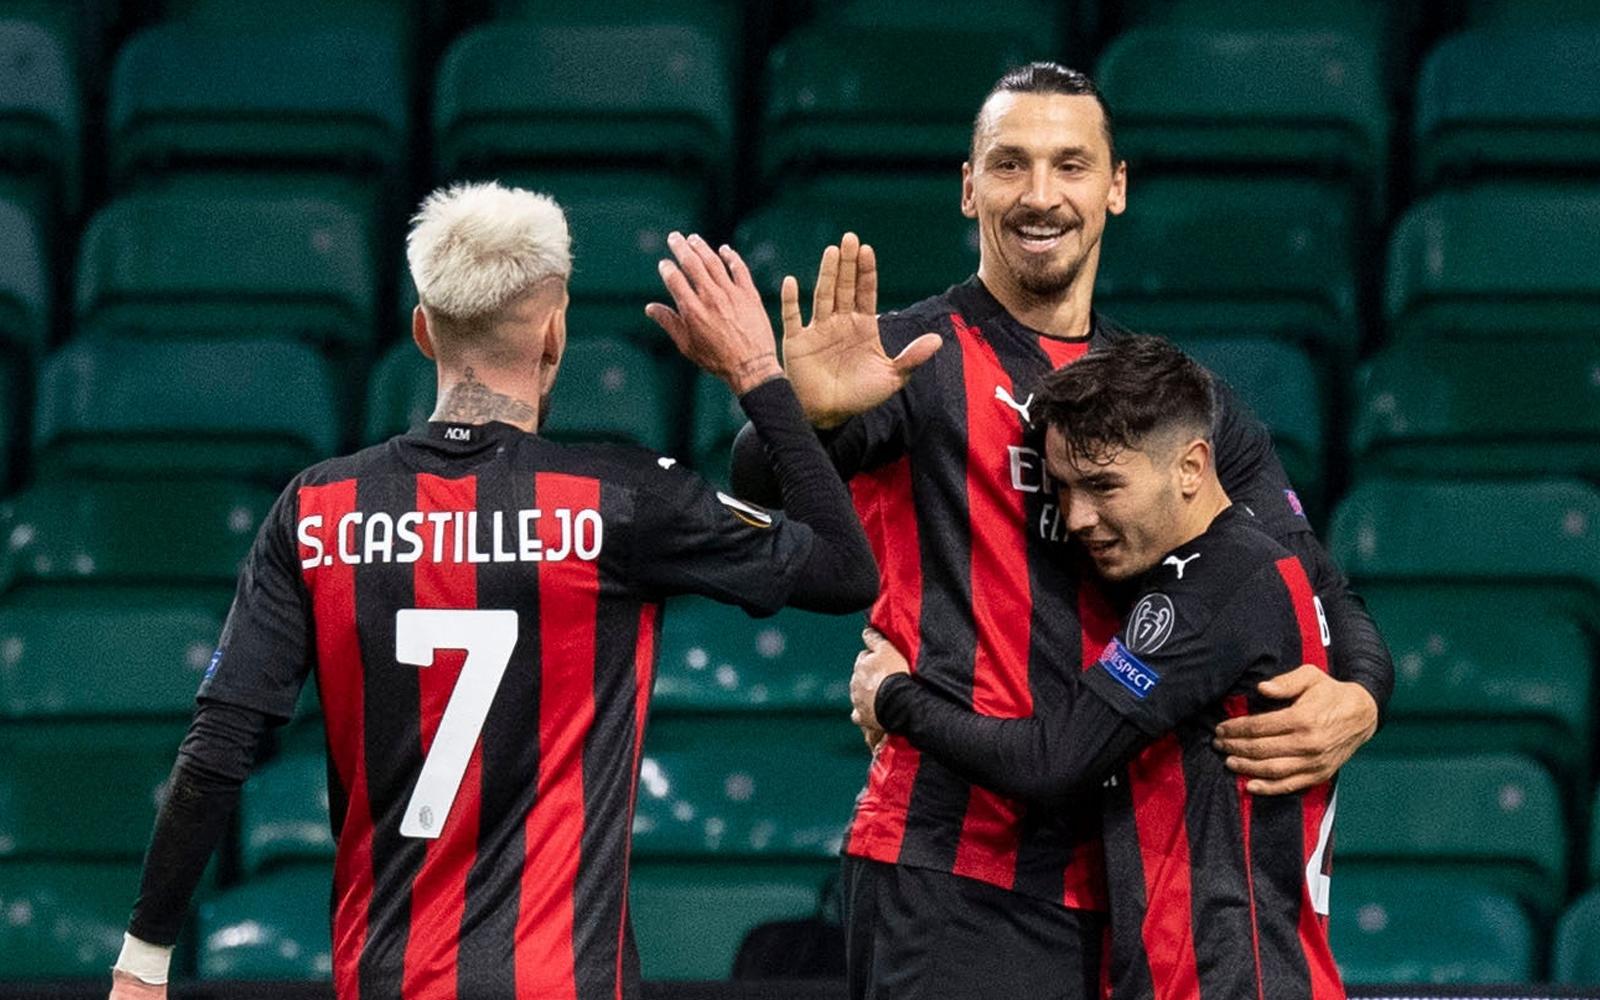 È un Milan sempre più immenso: 3-1 a Celtic Park | DAILY MILAN